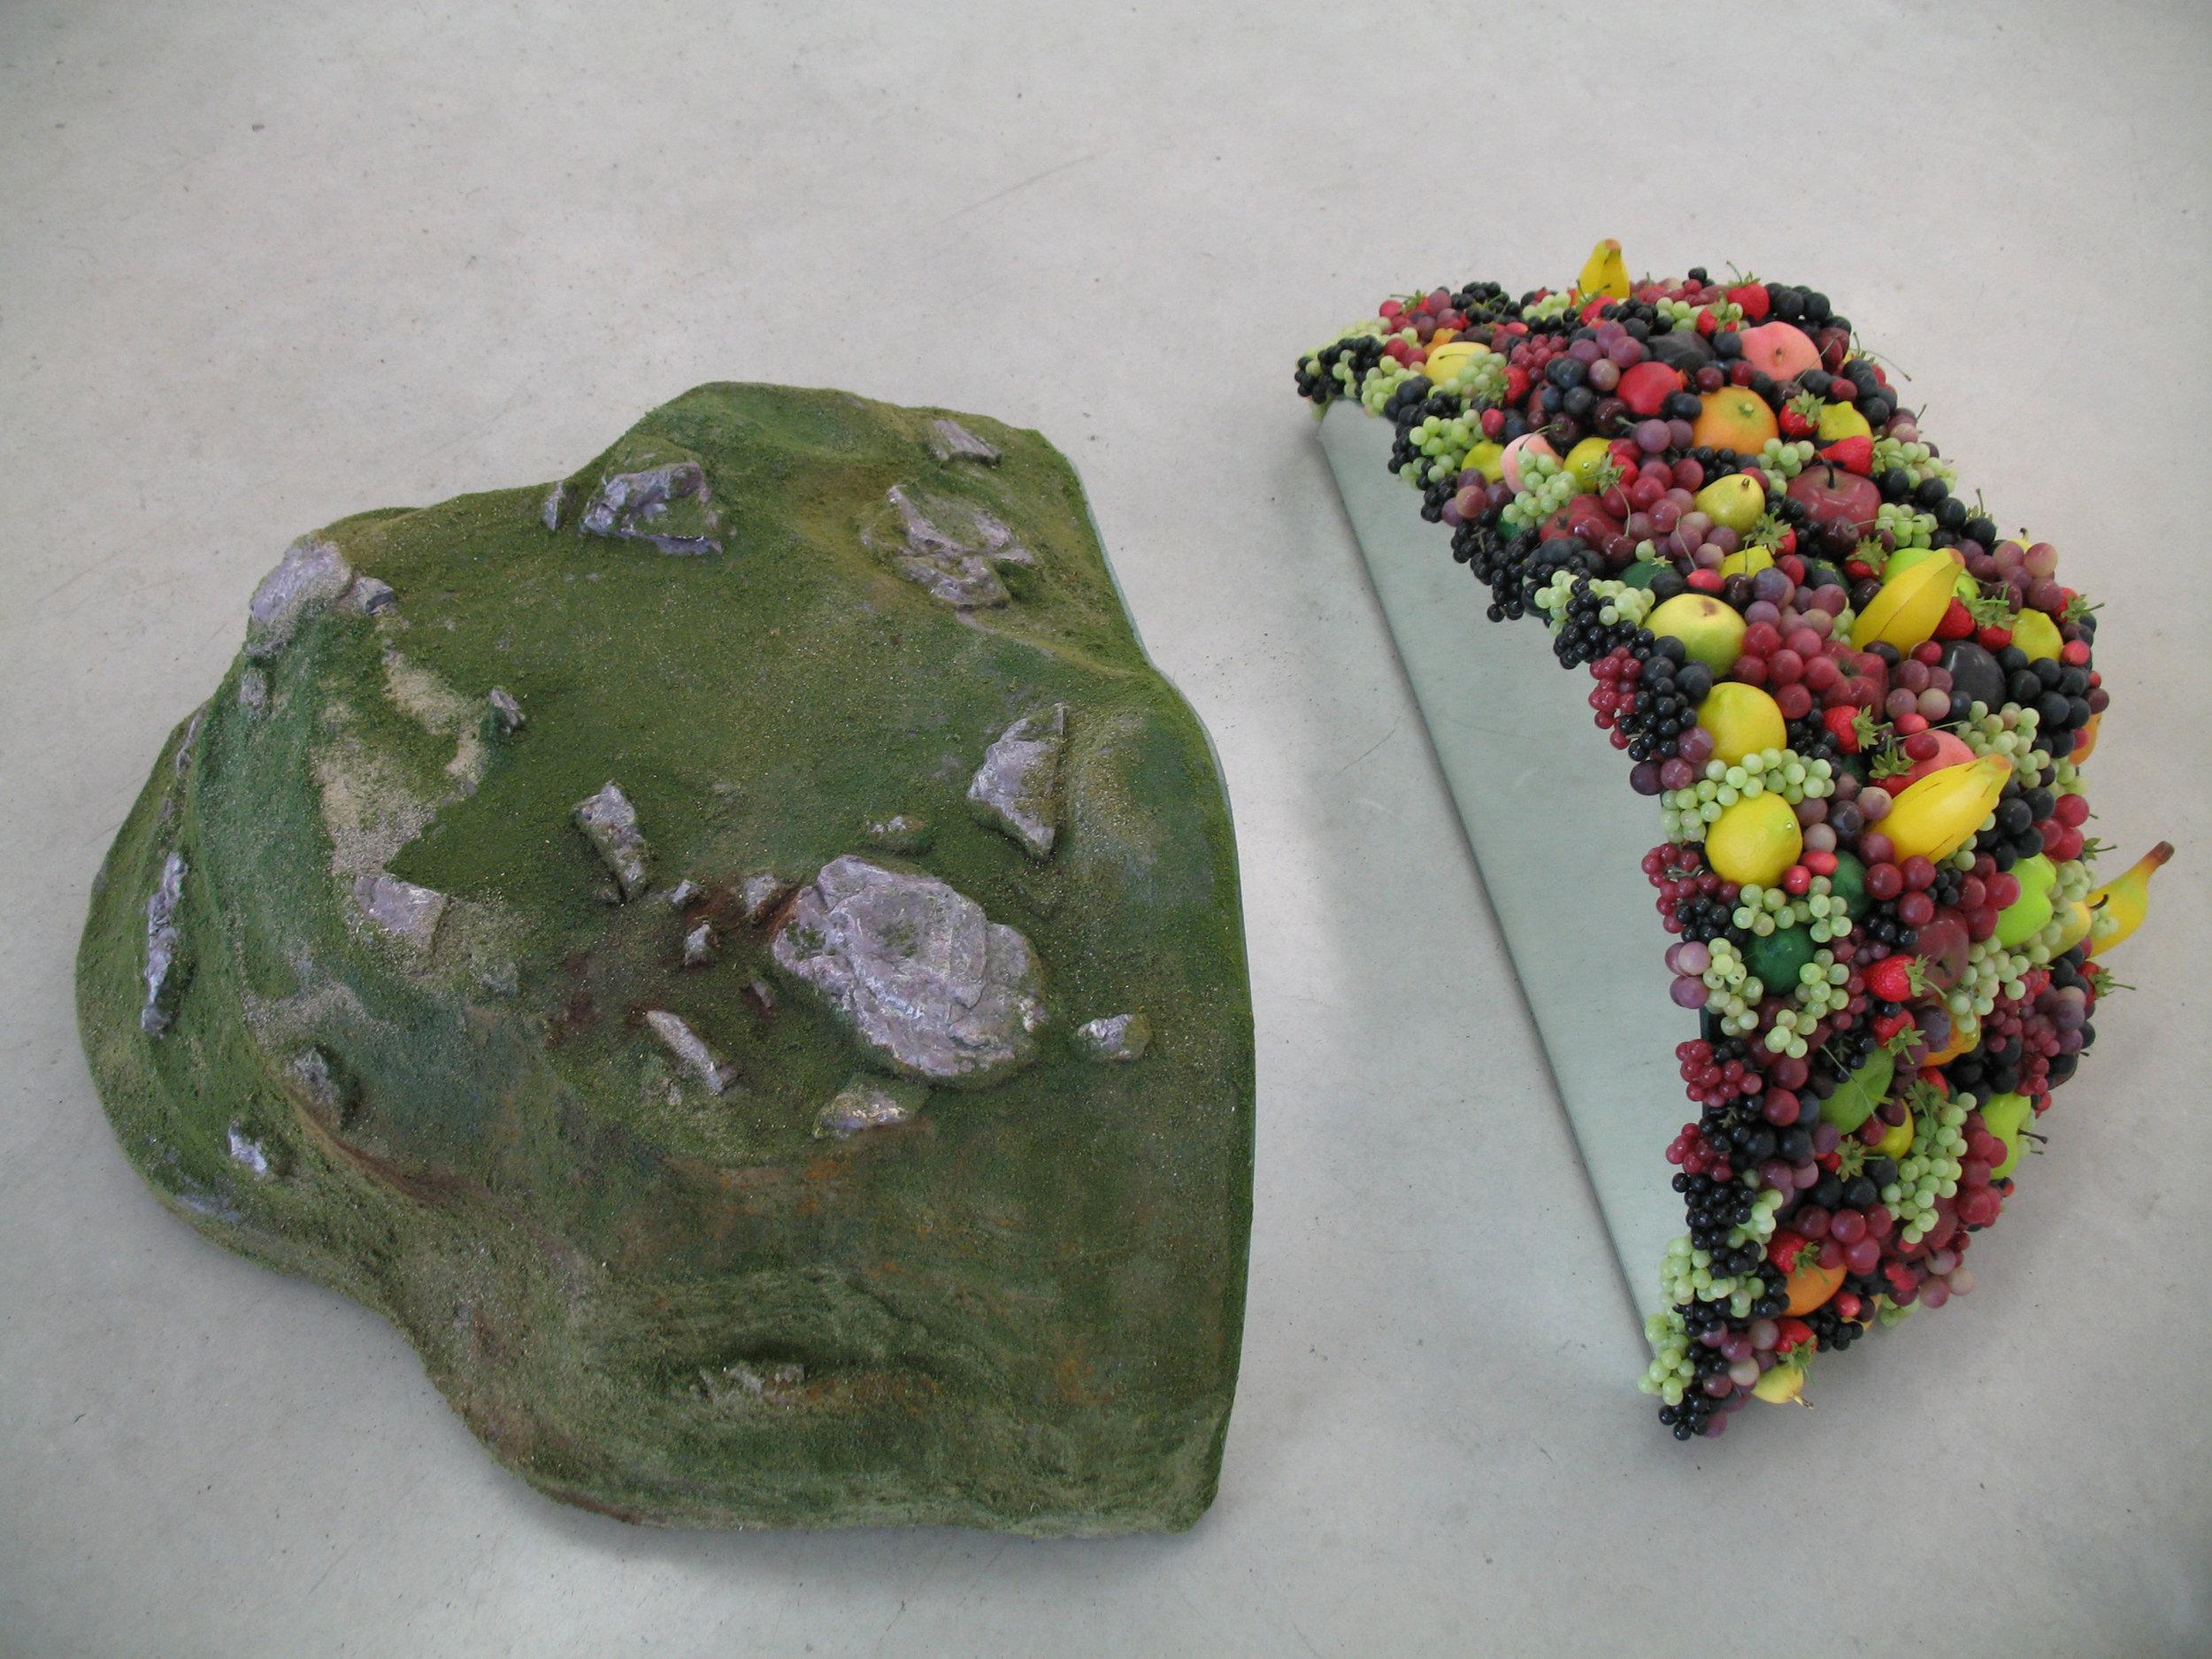 Fallacy, 2006 model railroad scenery, plastic fruits, mirror, styrofoam, wood 51 x 92 x 122 cm - 20 x 36 1/4 x 48 inches